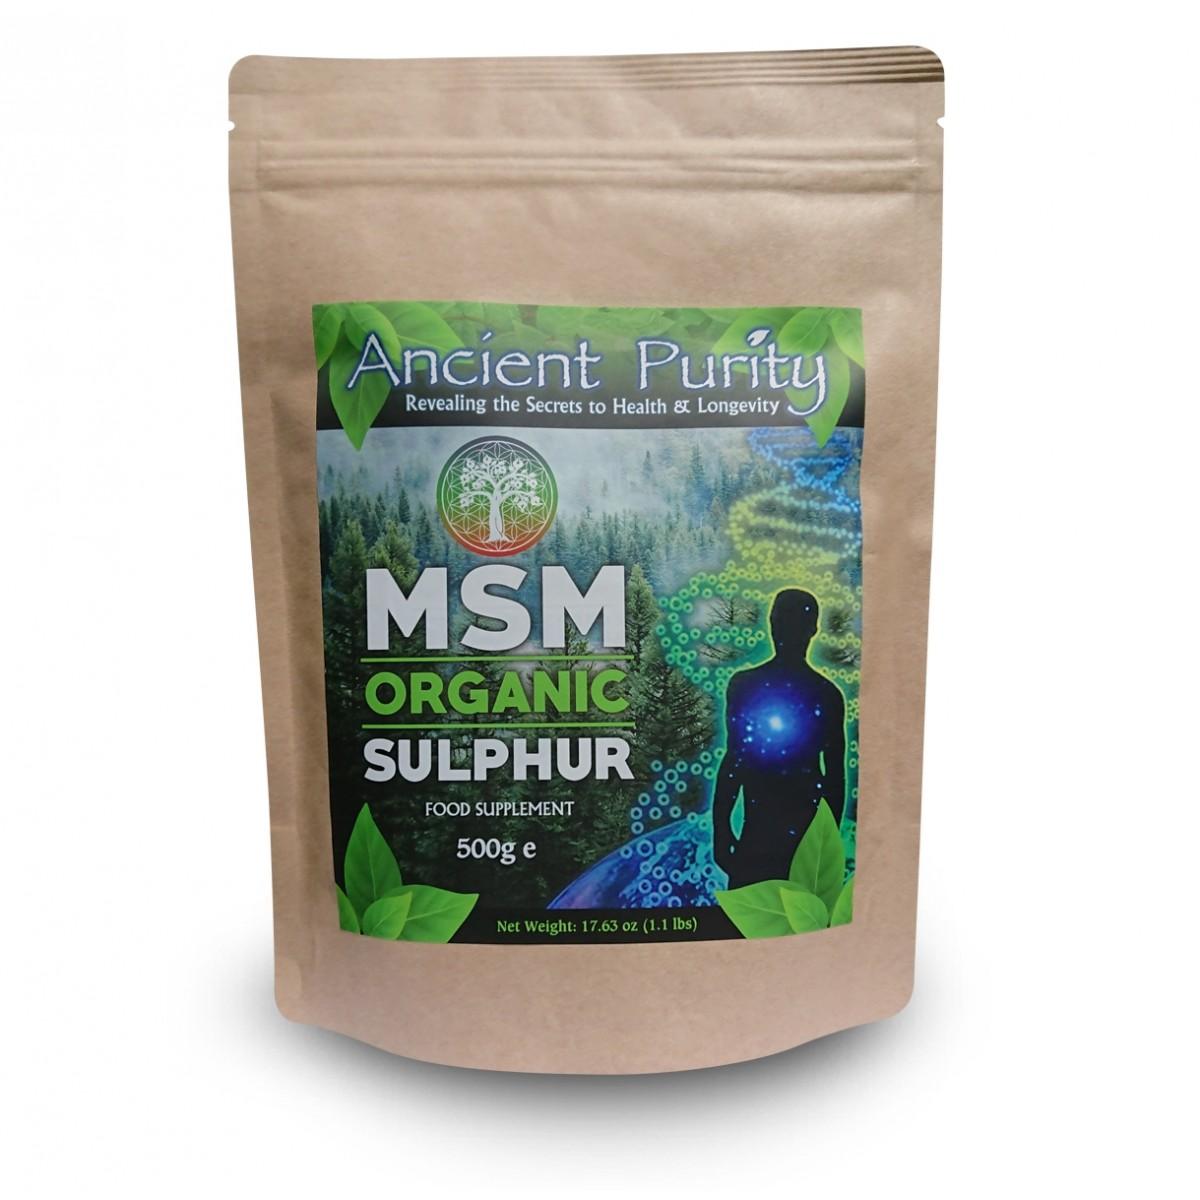 MSM Sulphur – Pure Organic Sulfur Supplement | Ancient Purity